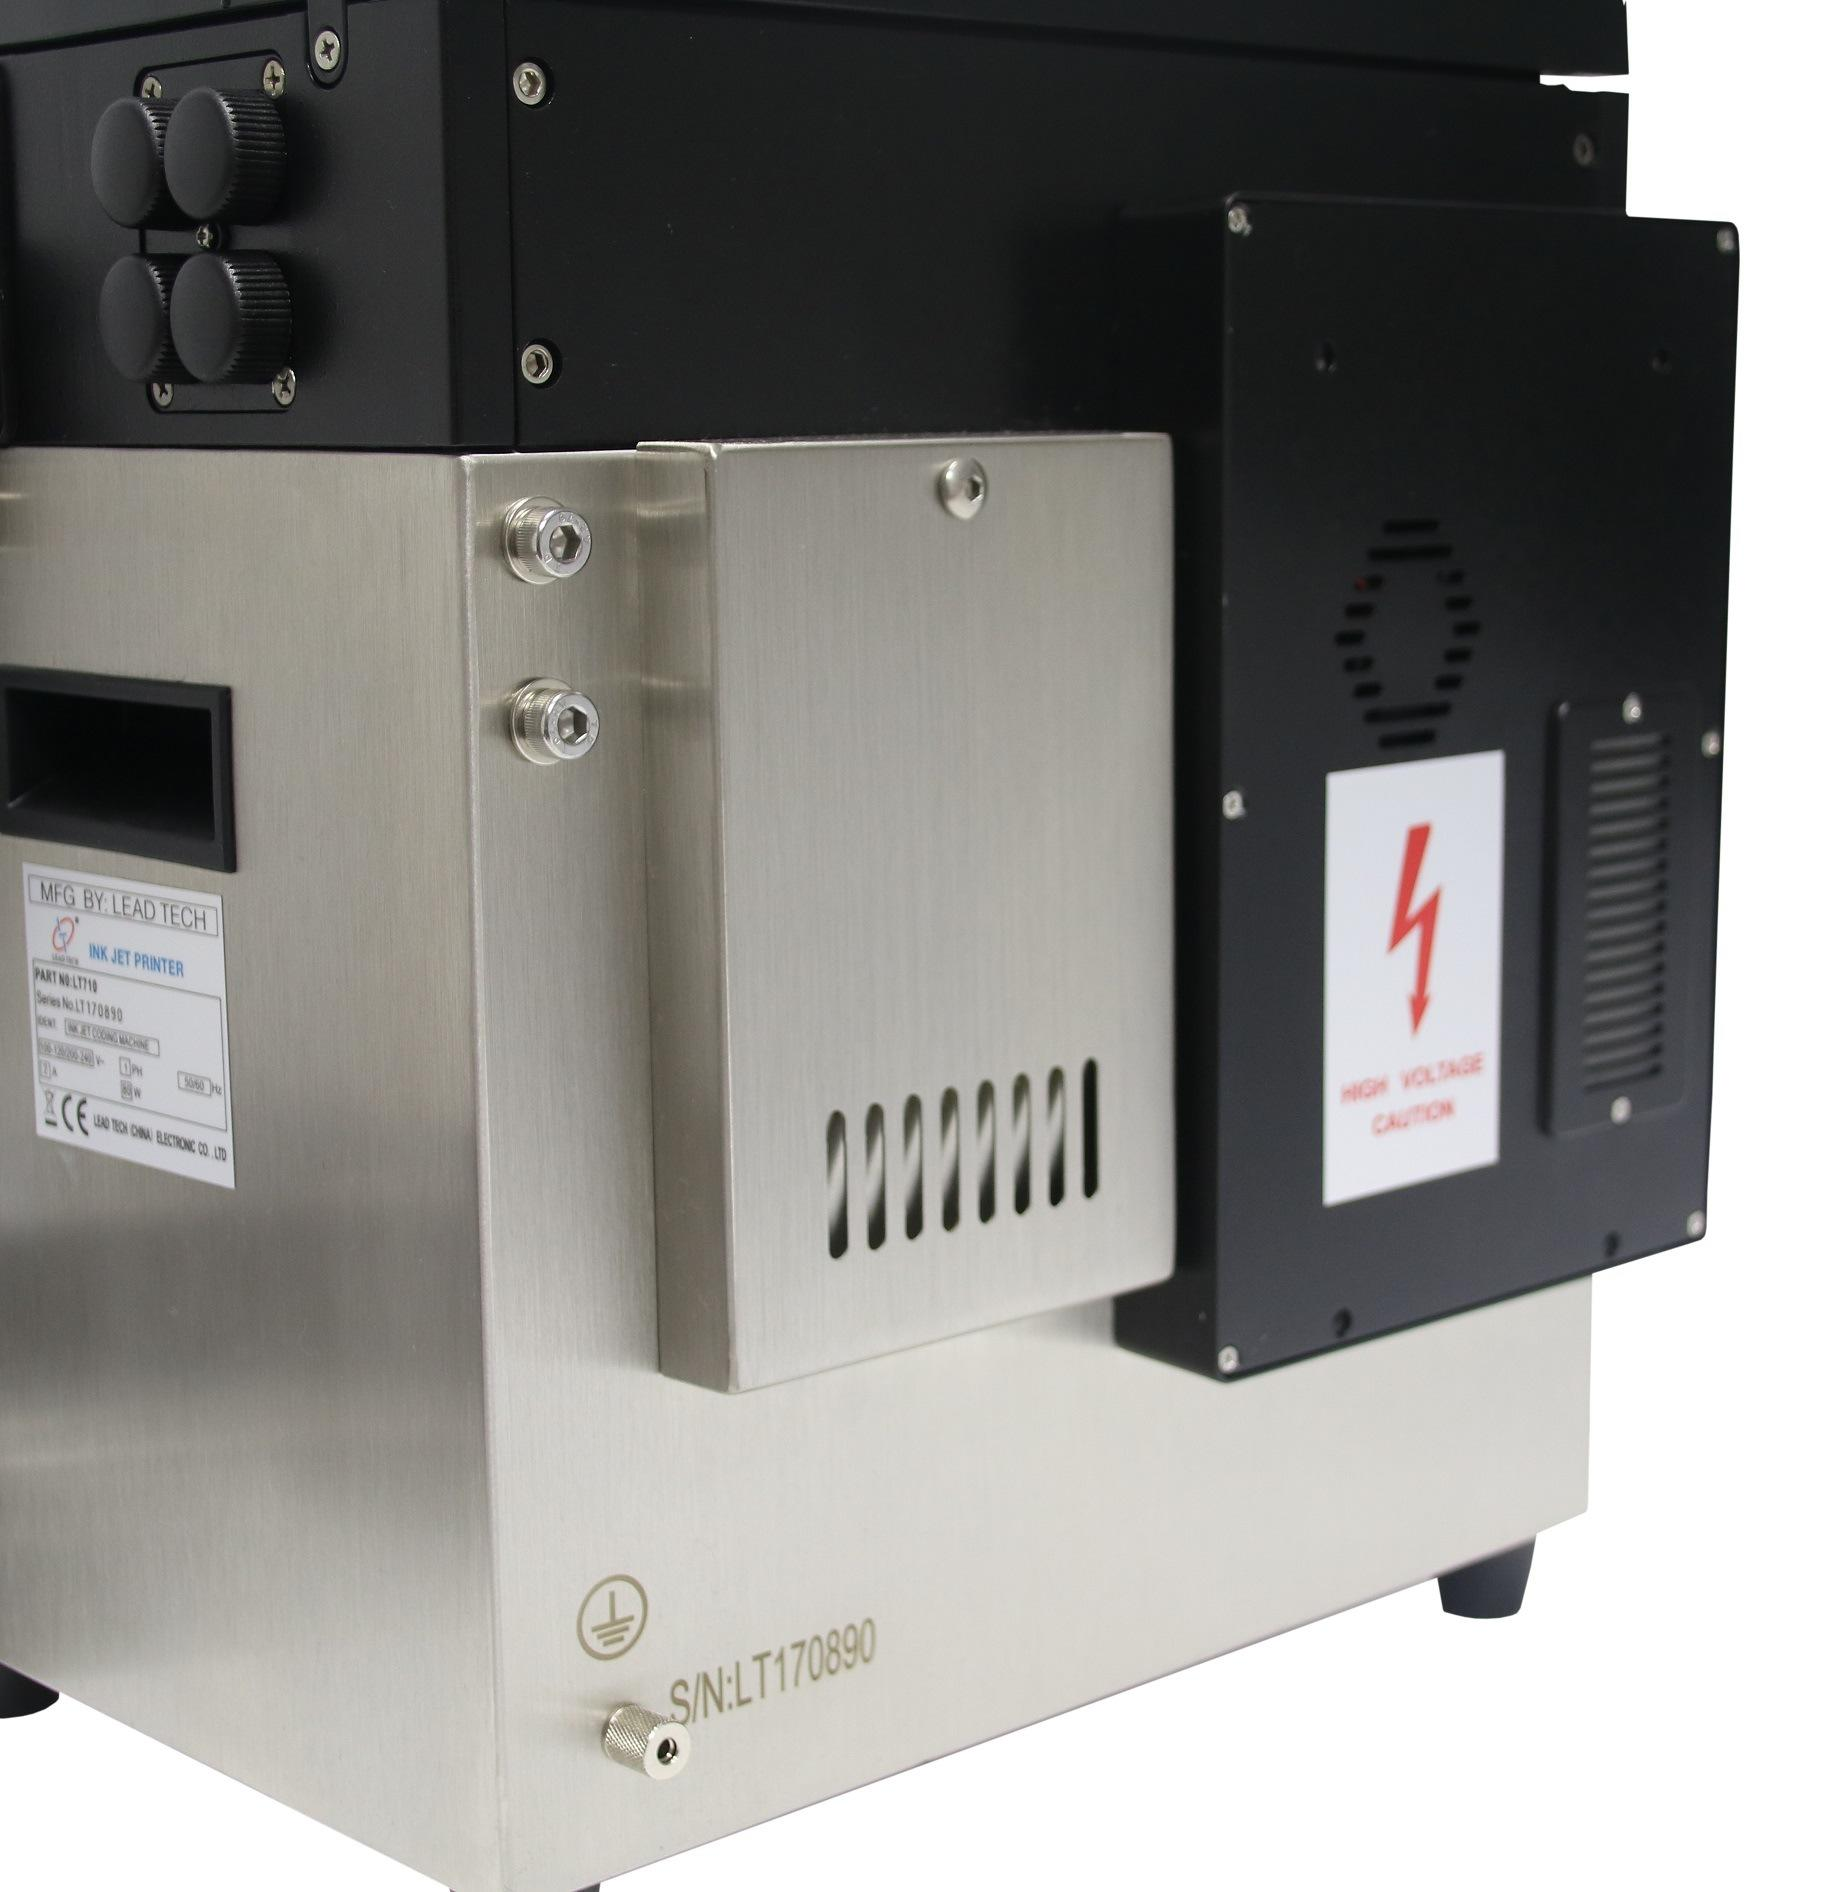 Lead Tech Lt760 Reverse Printing Inkjet Printer